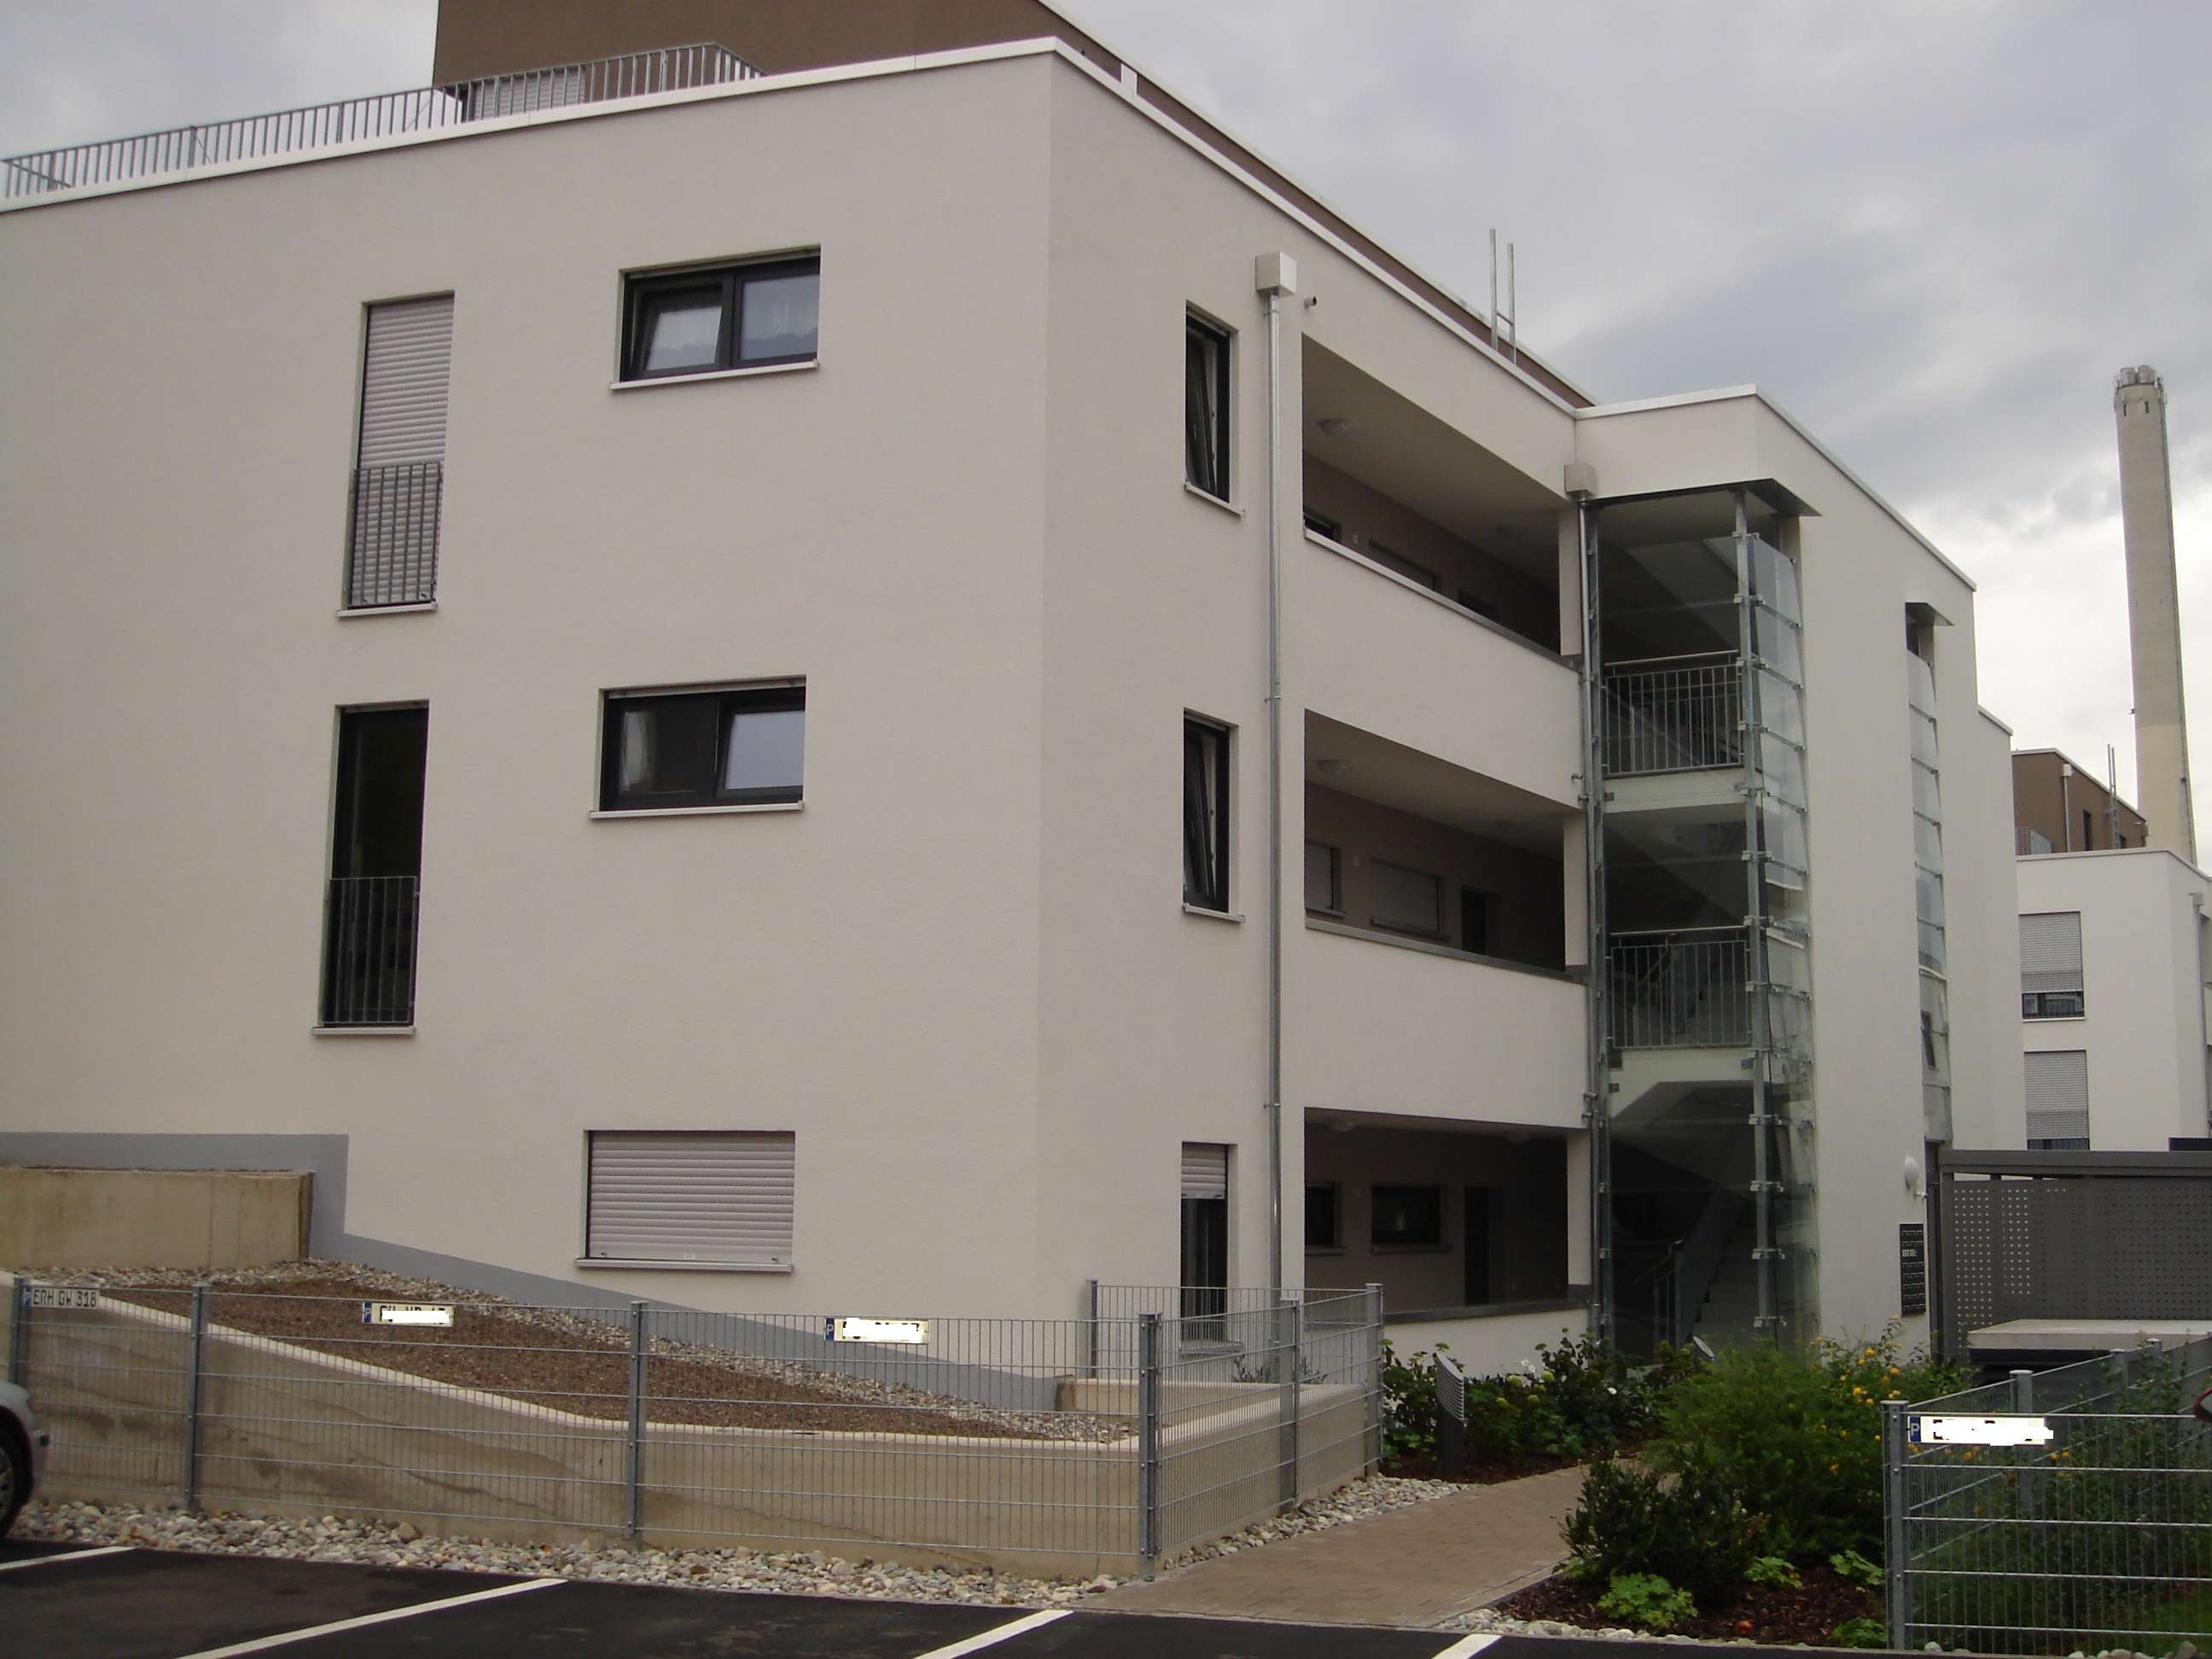 *RESERVIERT*Managerappartement -möbliert-207 in Erlangen - Zentrum (Erlangen)